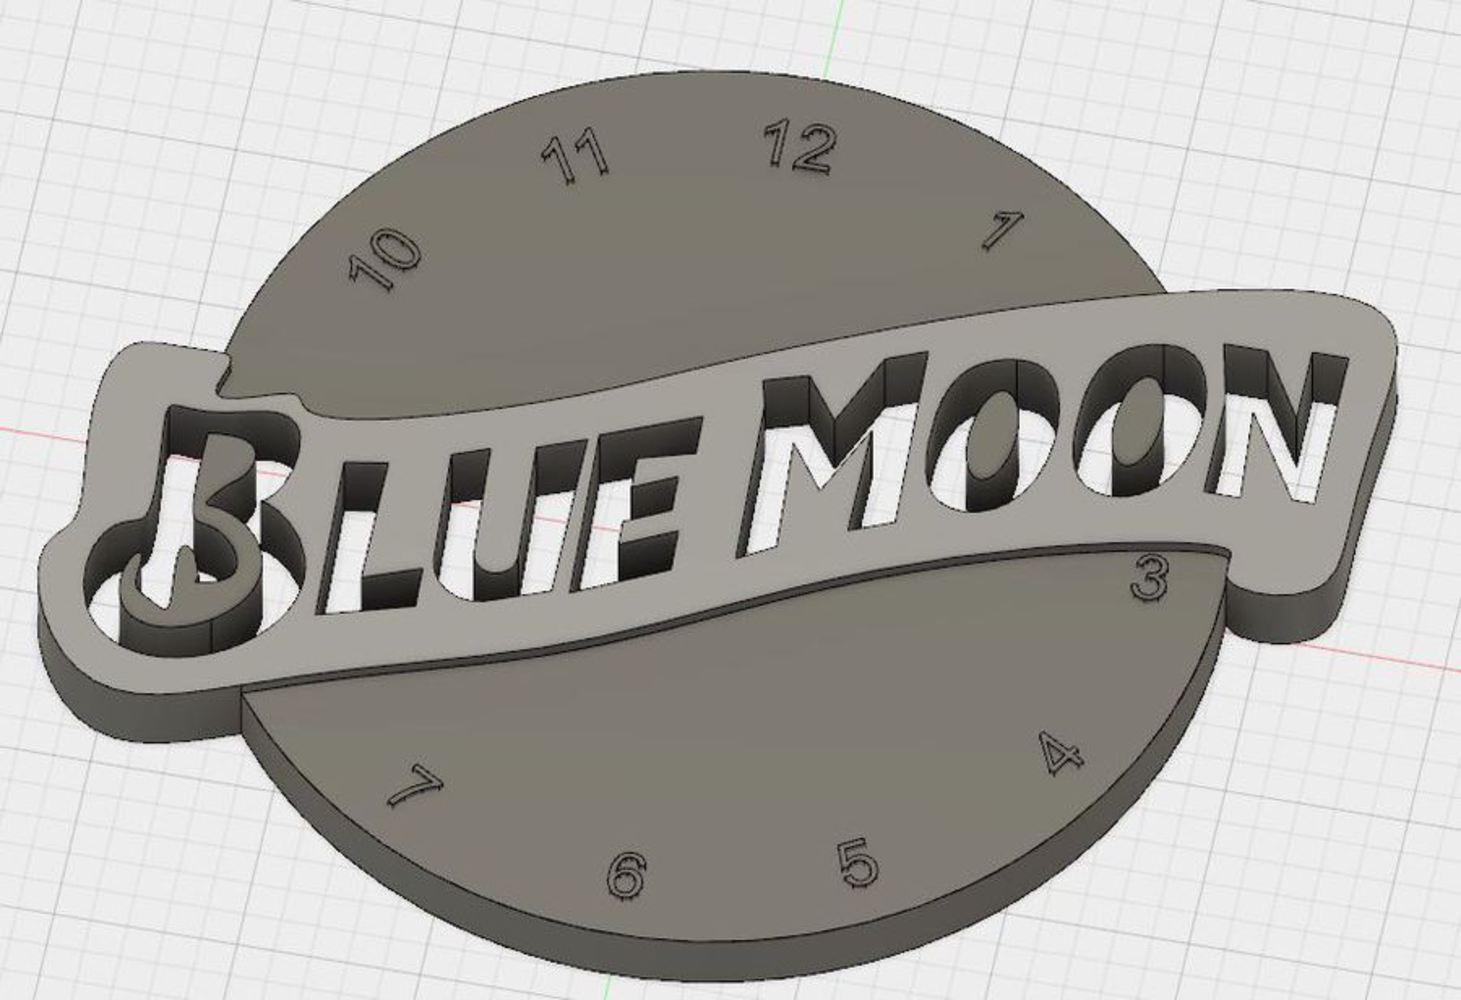 Blue moon fusion.jpg.thumb